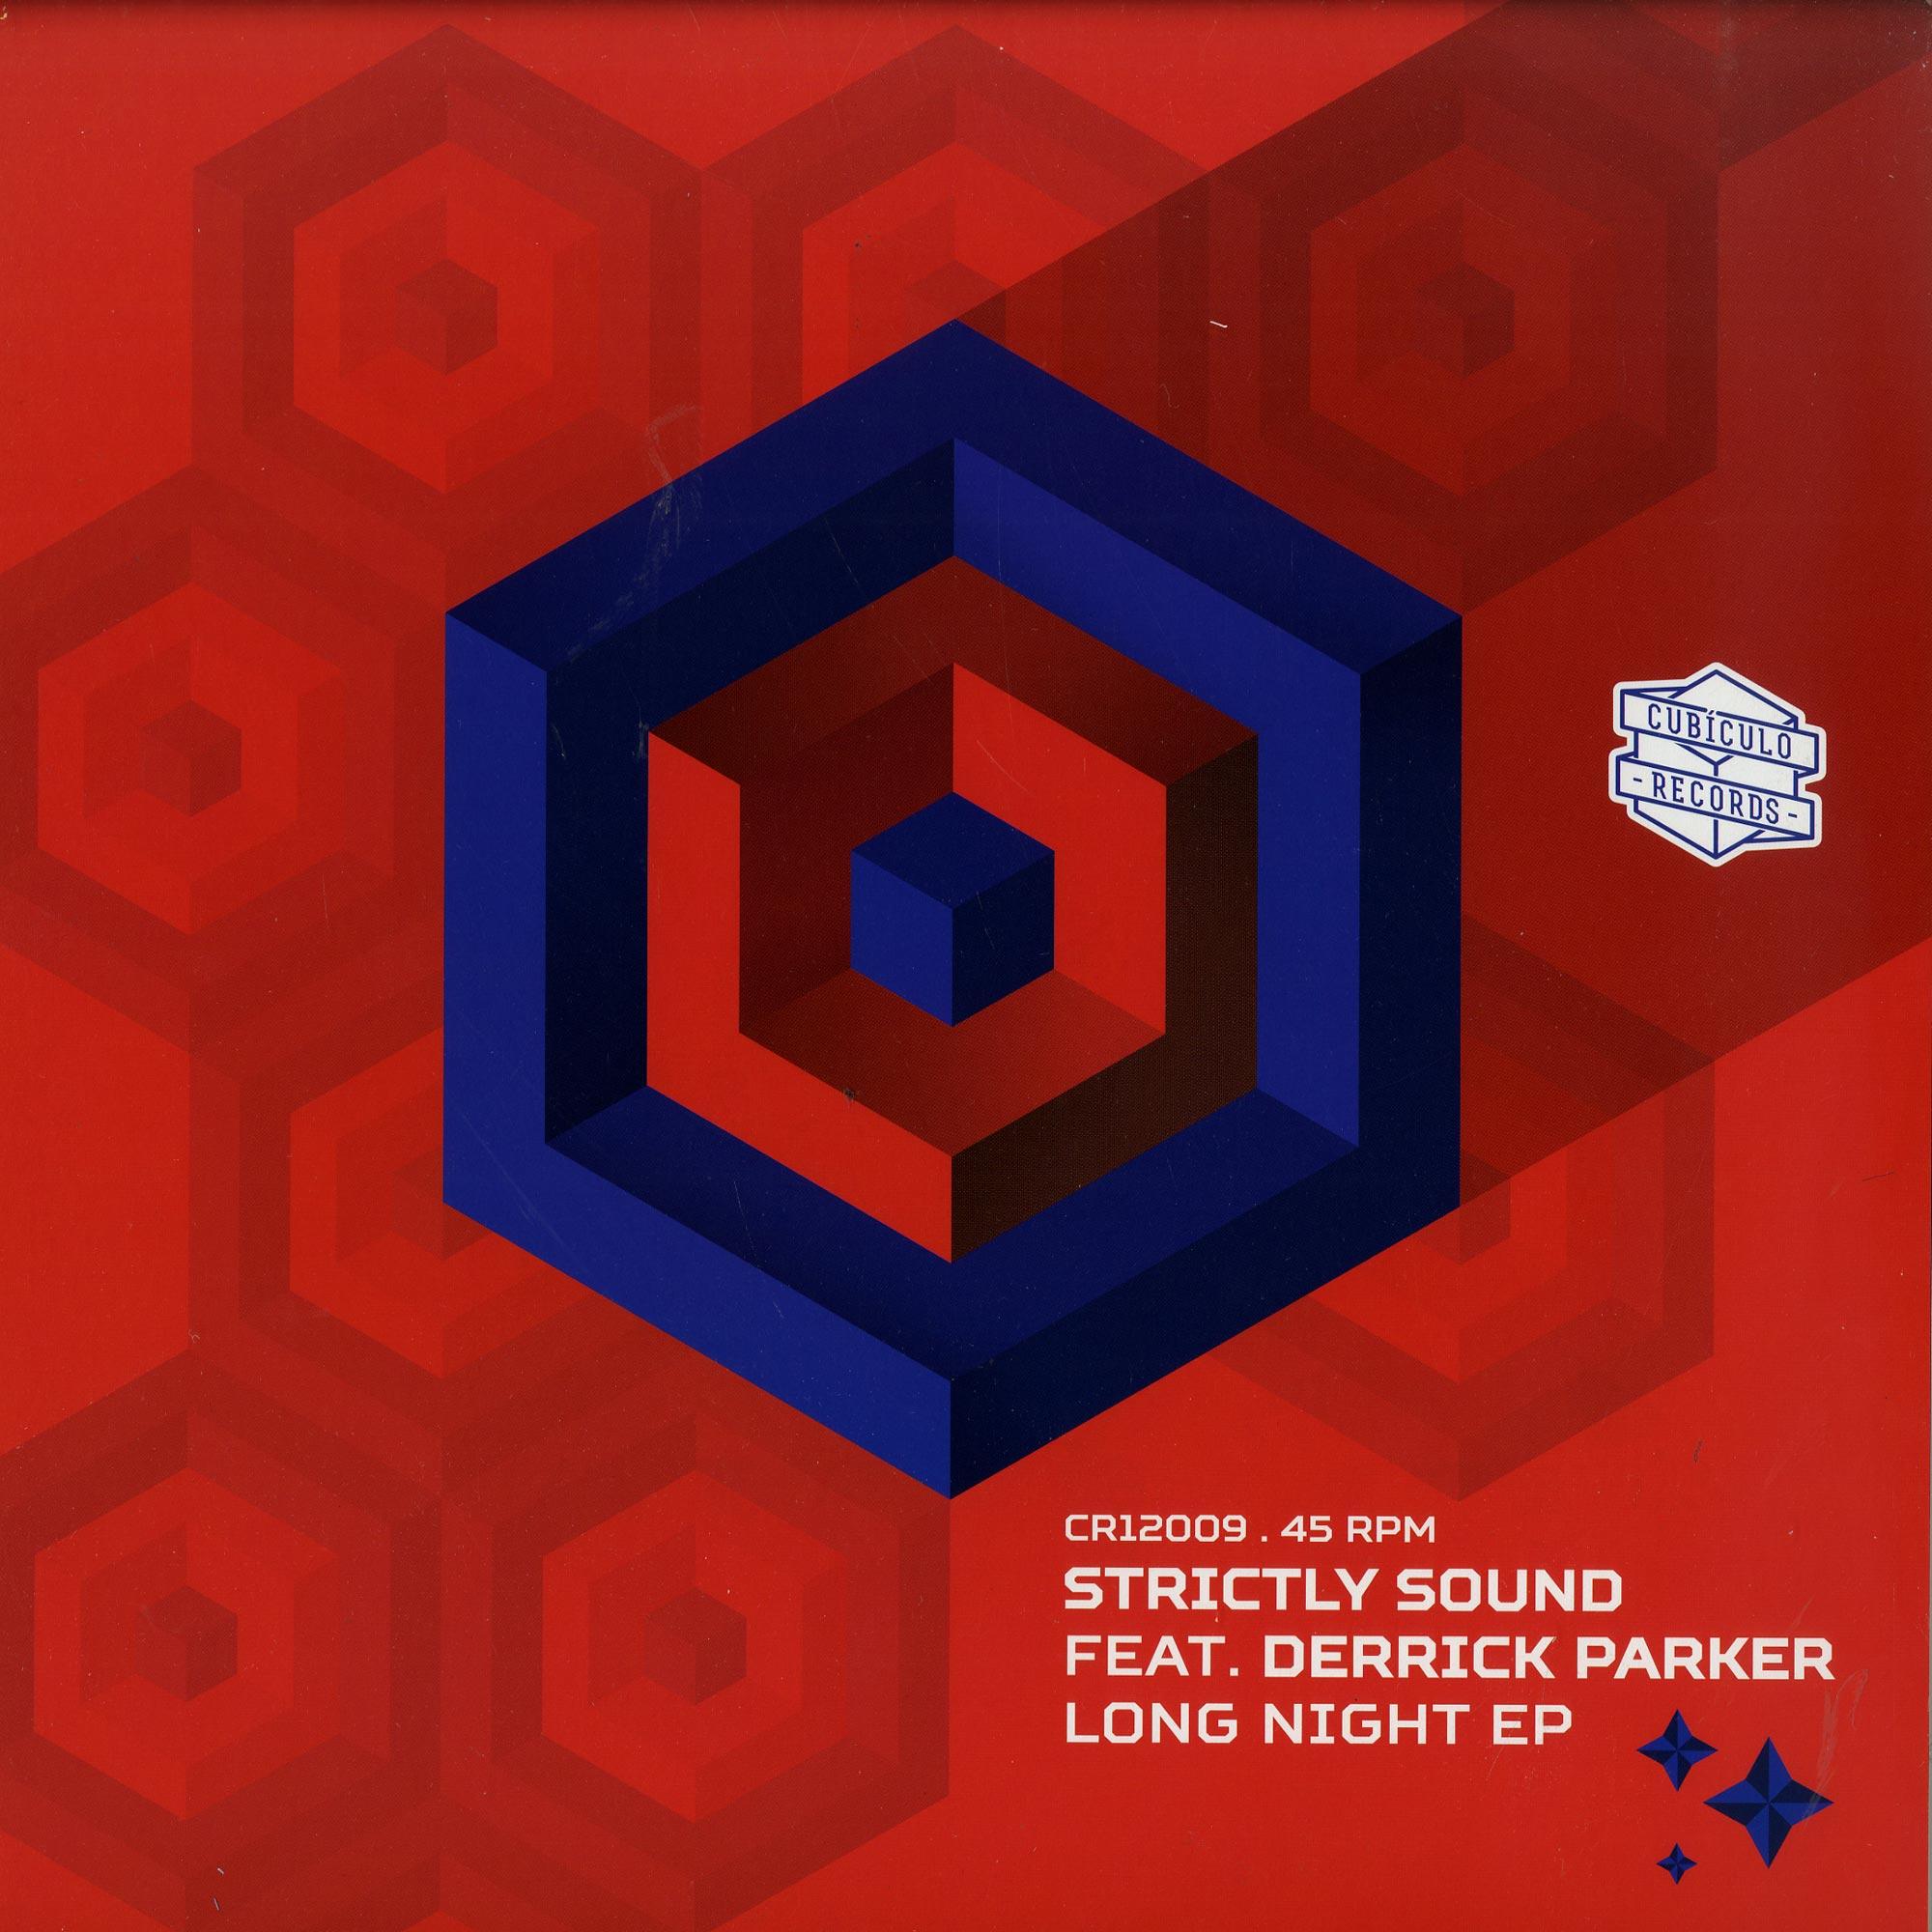 Strictly Sound ft. Derrick Parker - LONG NIGHT EP